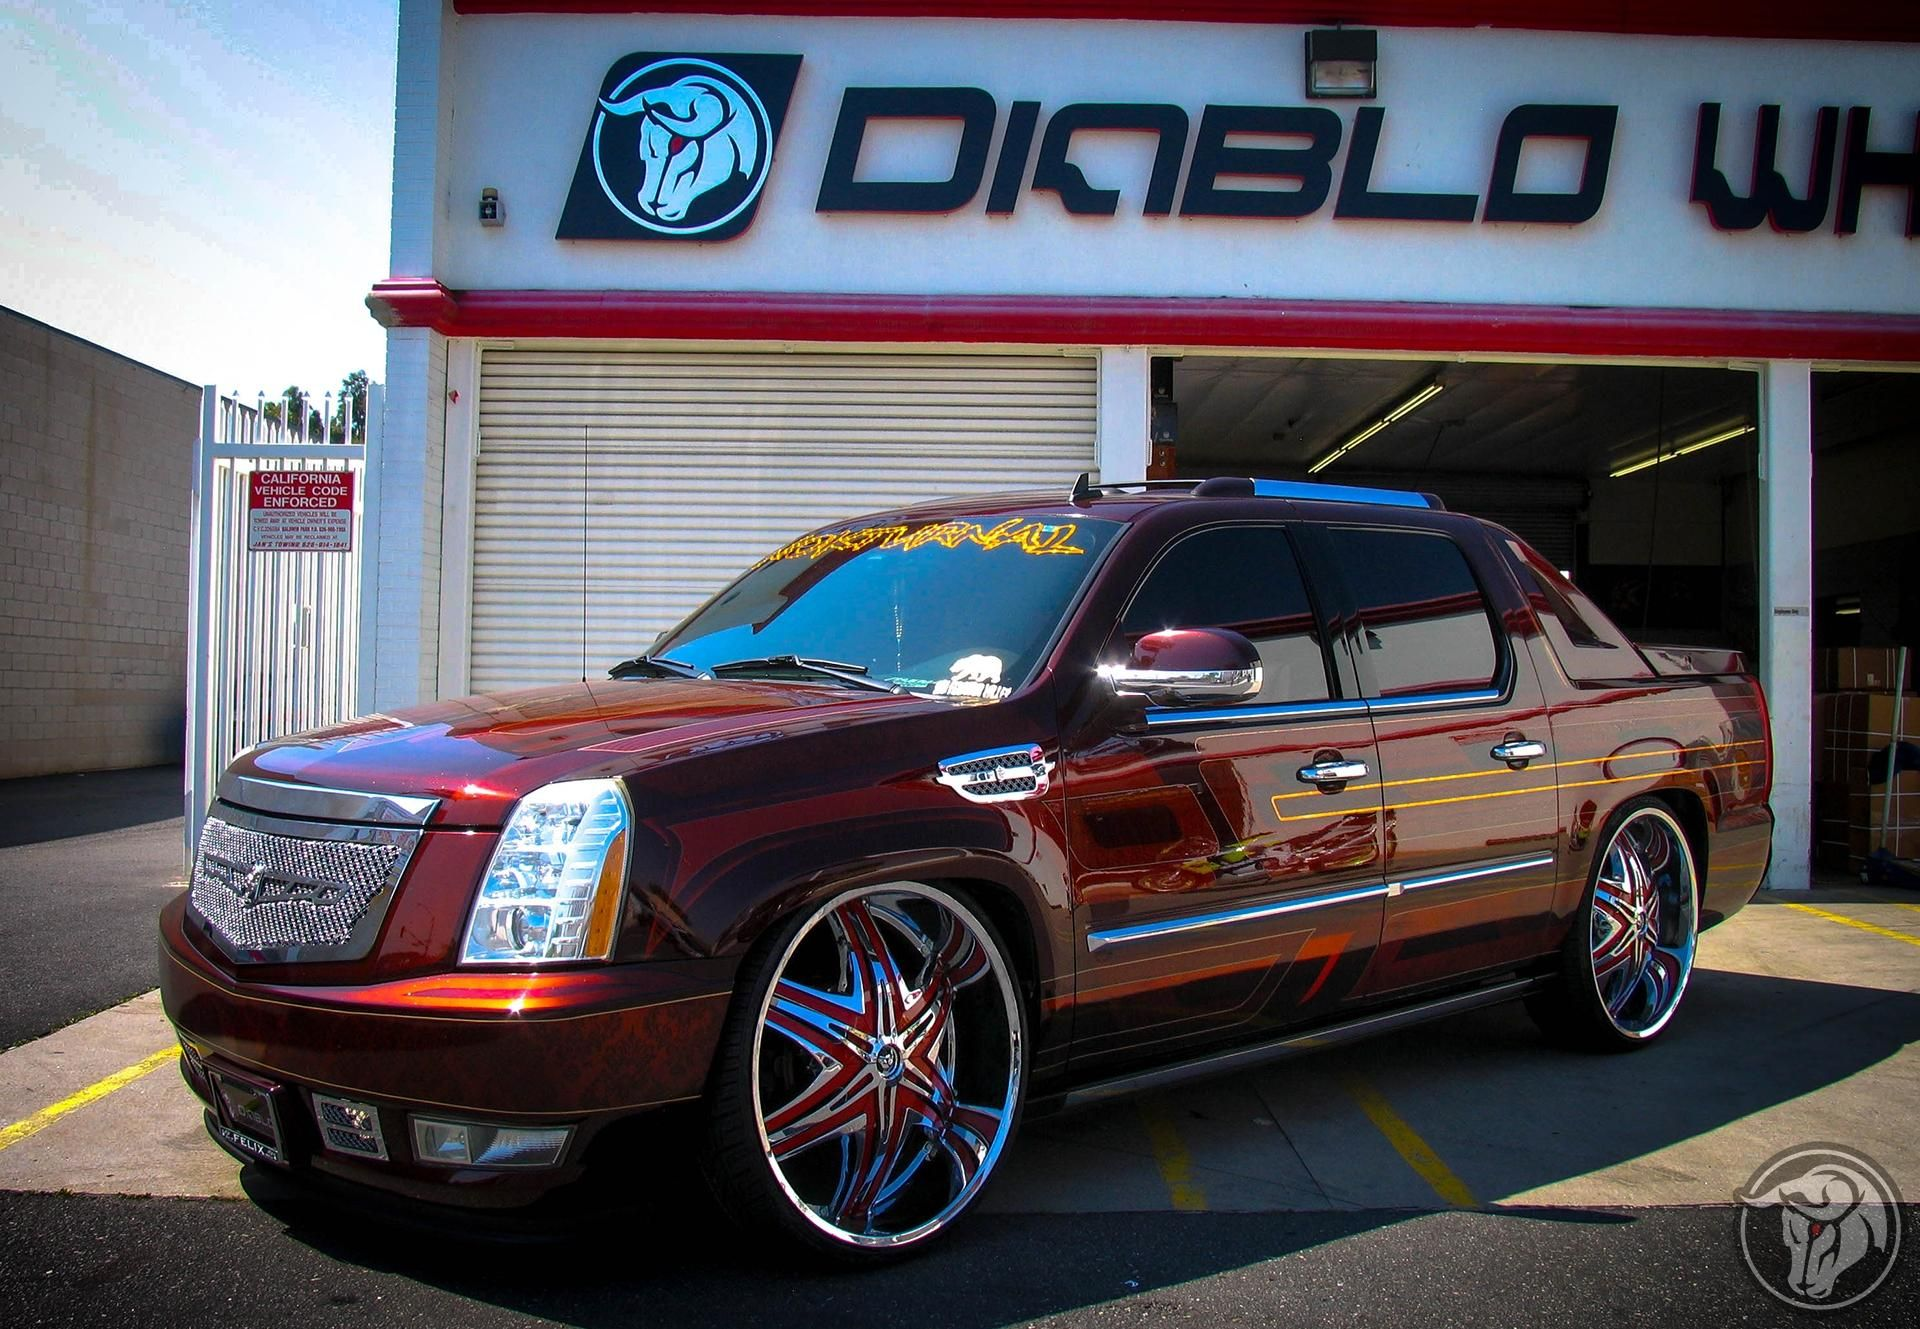 Escalade Ext Custome Vehicle Gallery Diablo Wheels Vehicles Gallery Bmw Car